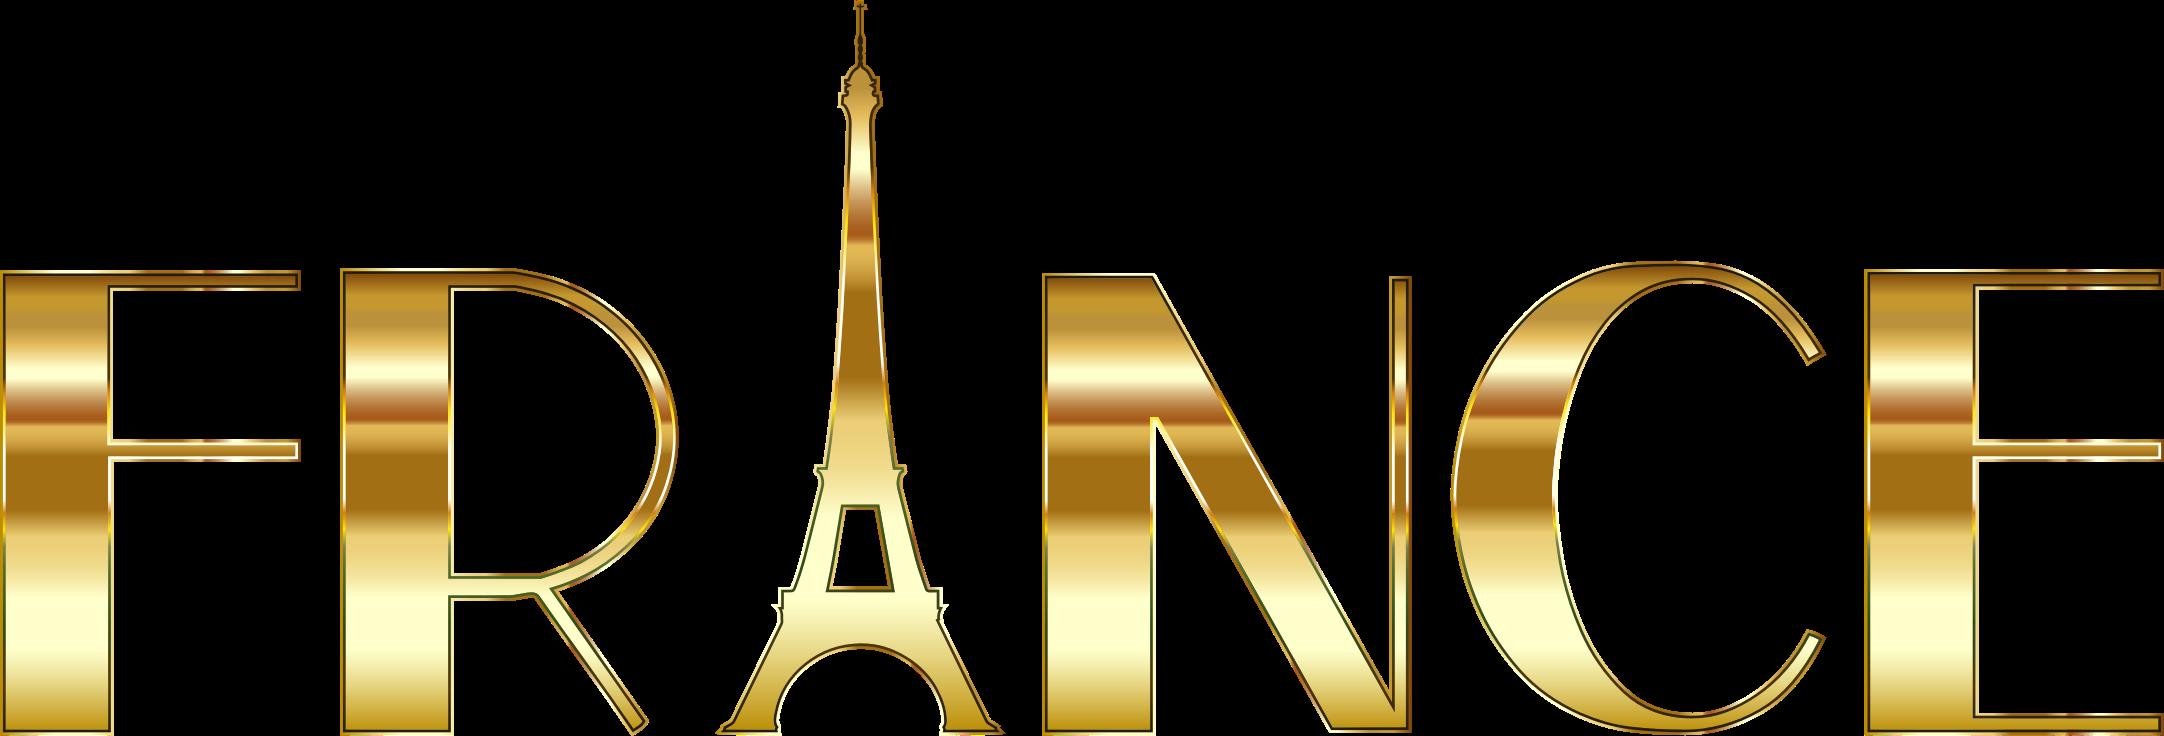 France eiffel tower clip art.